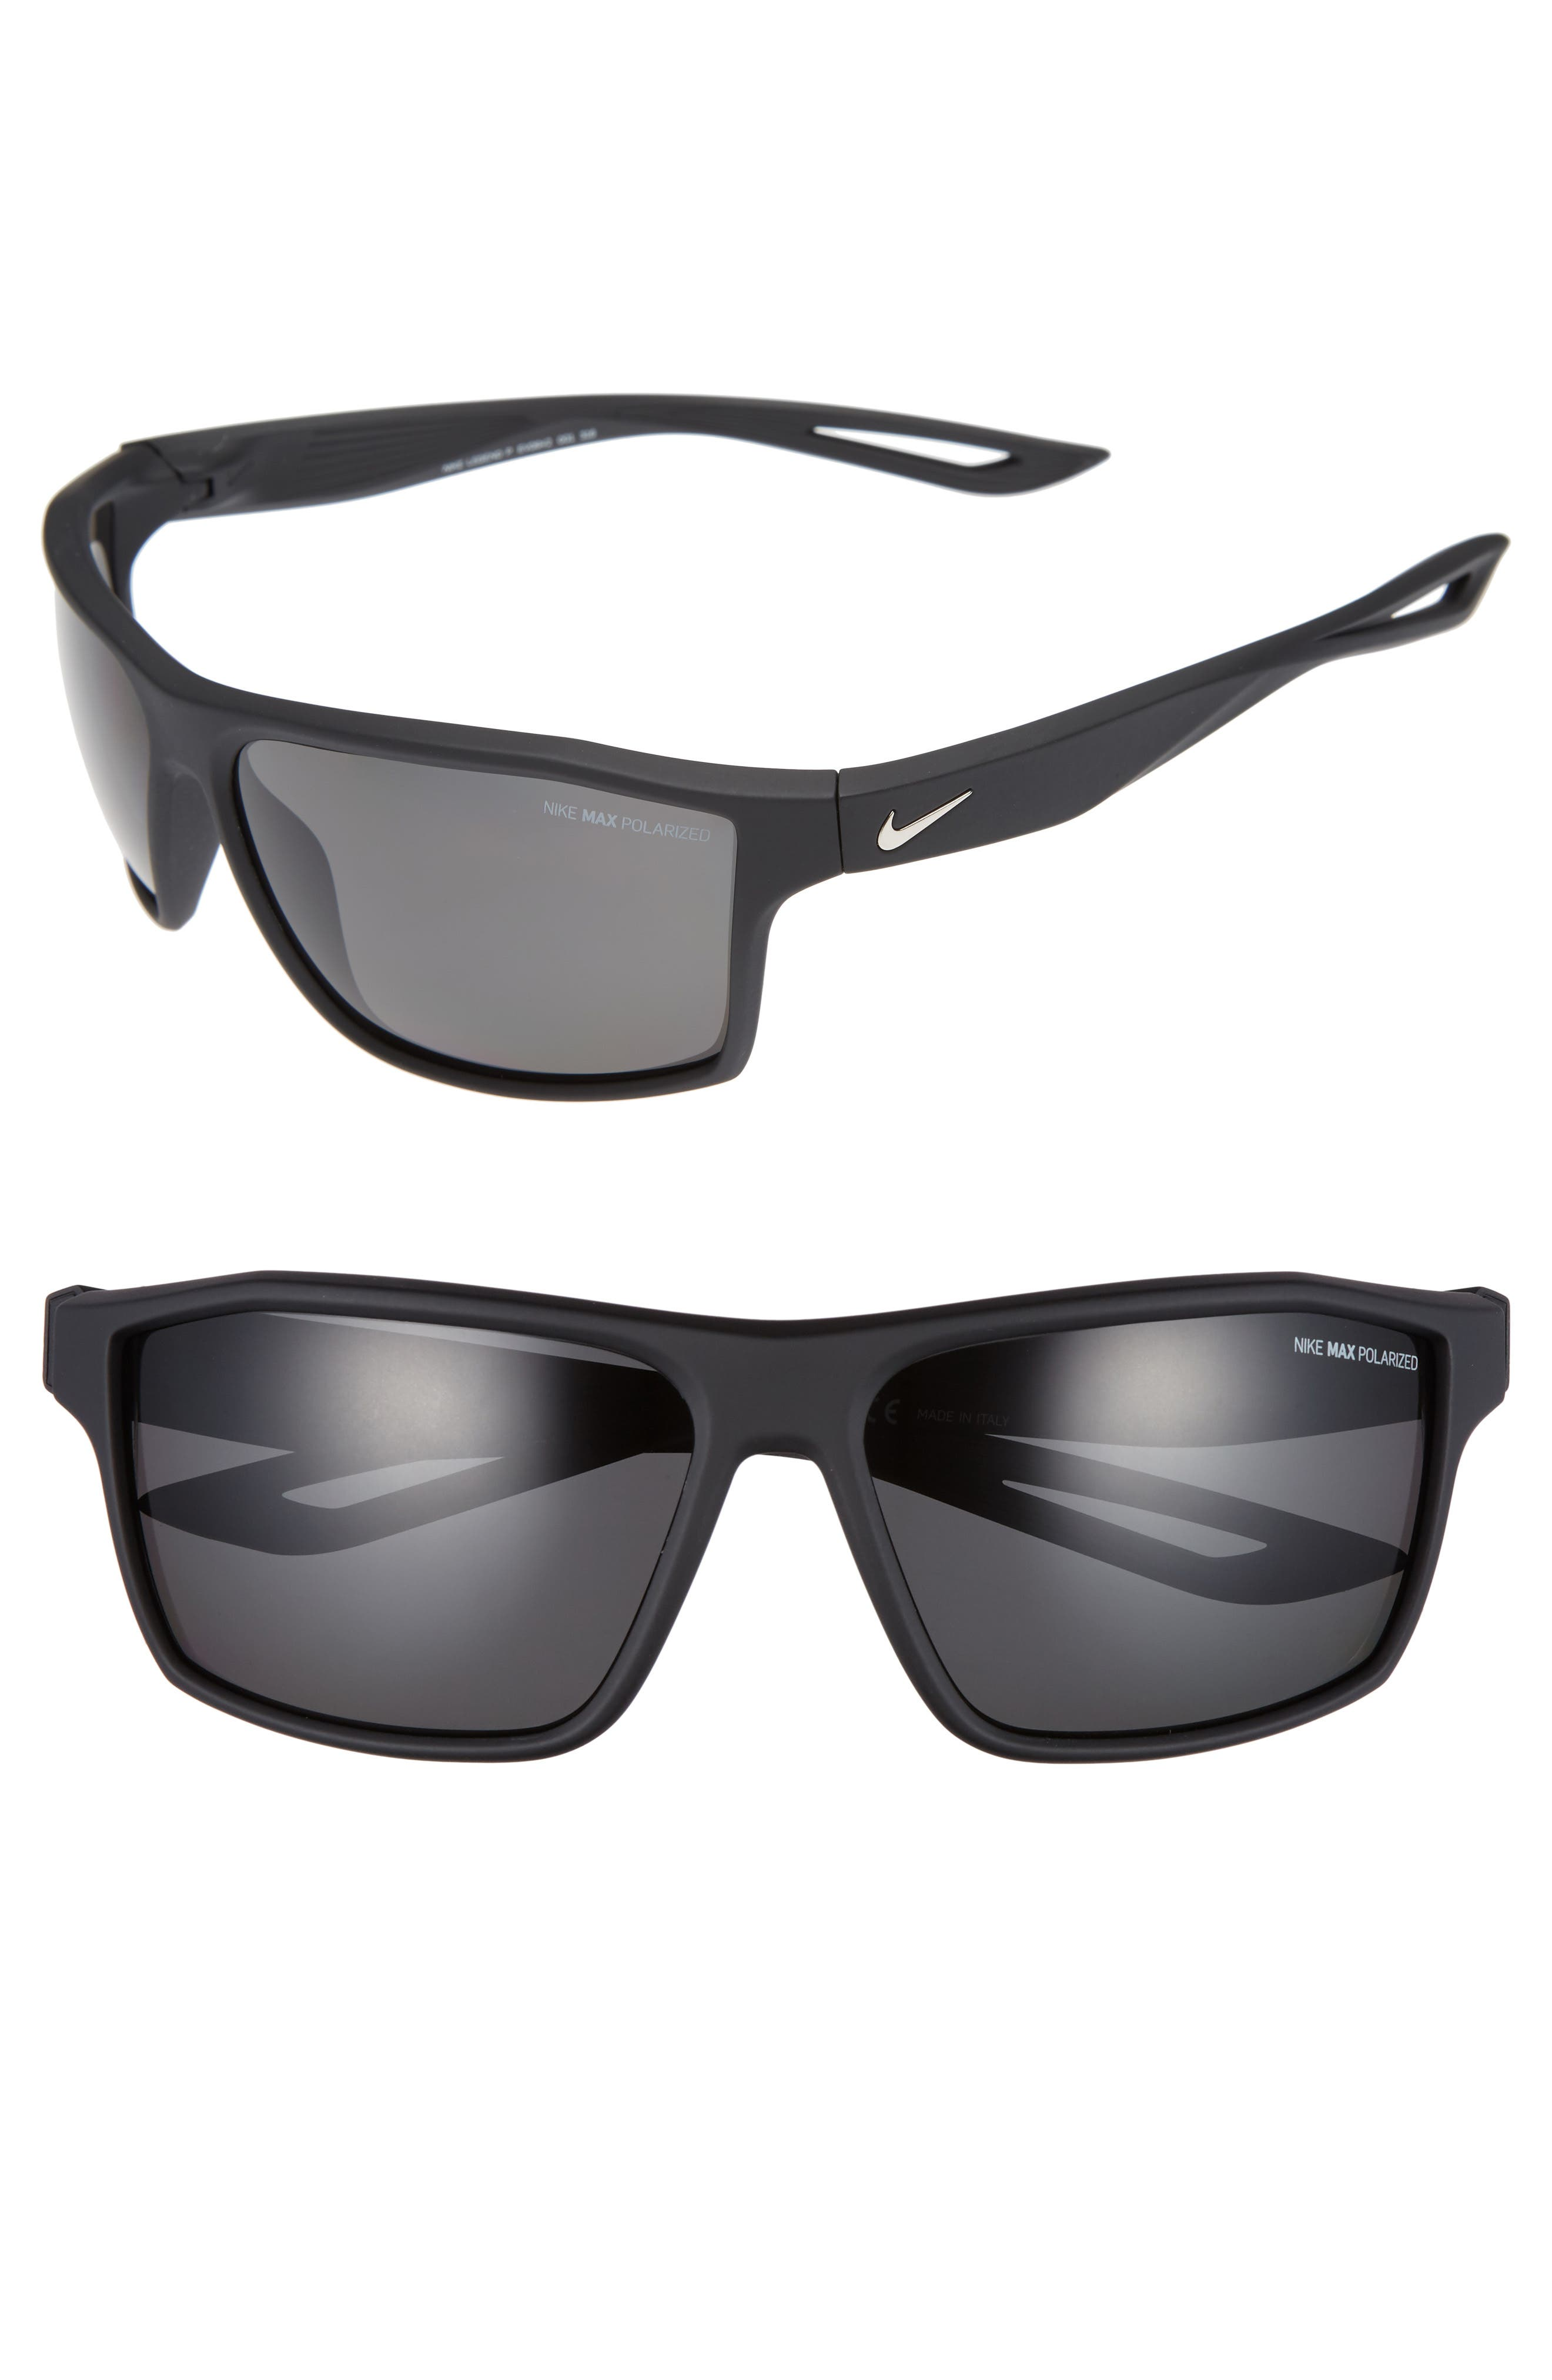 Main Image - Nike Legend 65mm Polarized Multi-Sport Sunglasses